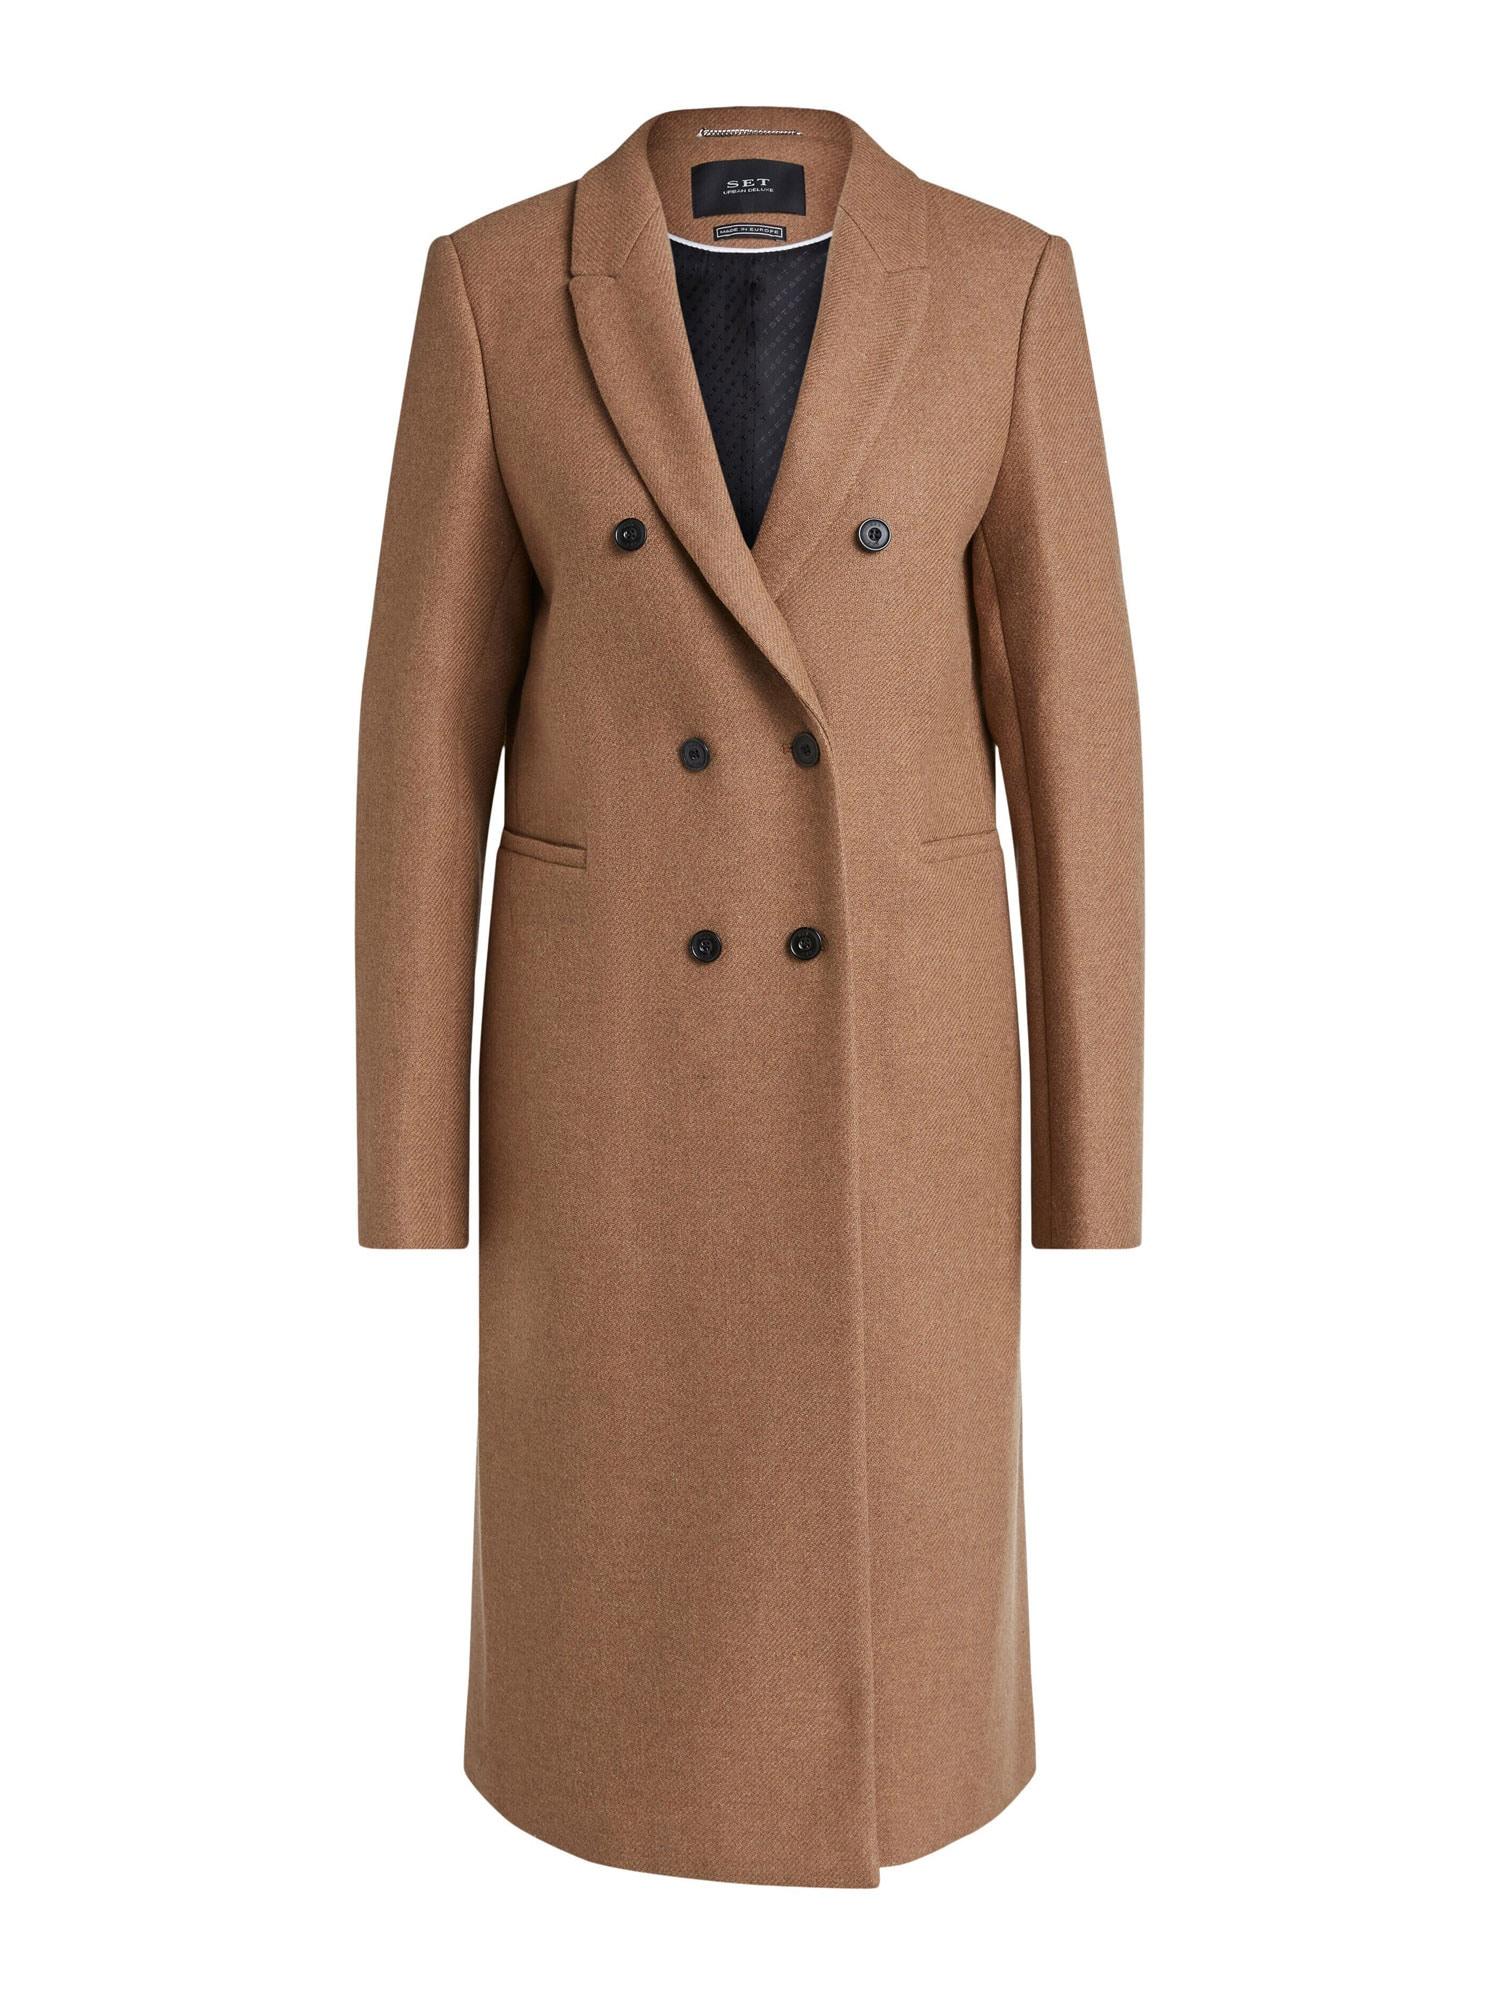 SET Demisezoninis paltas margai ruda